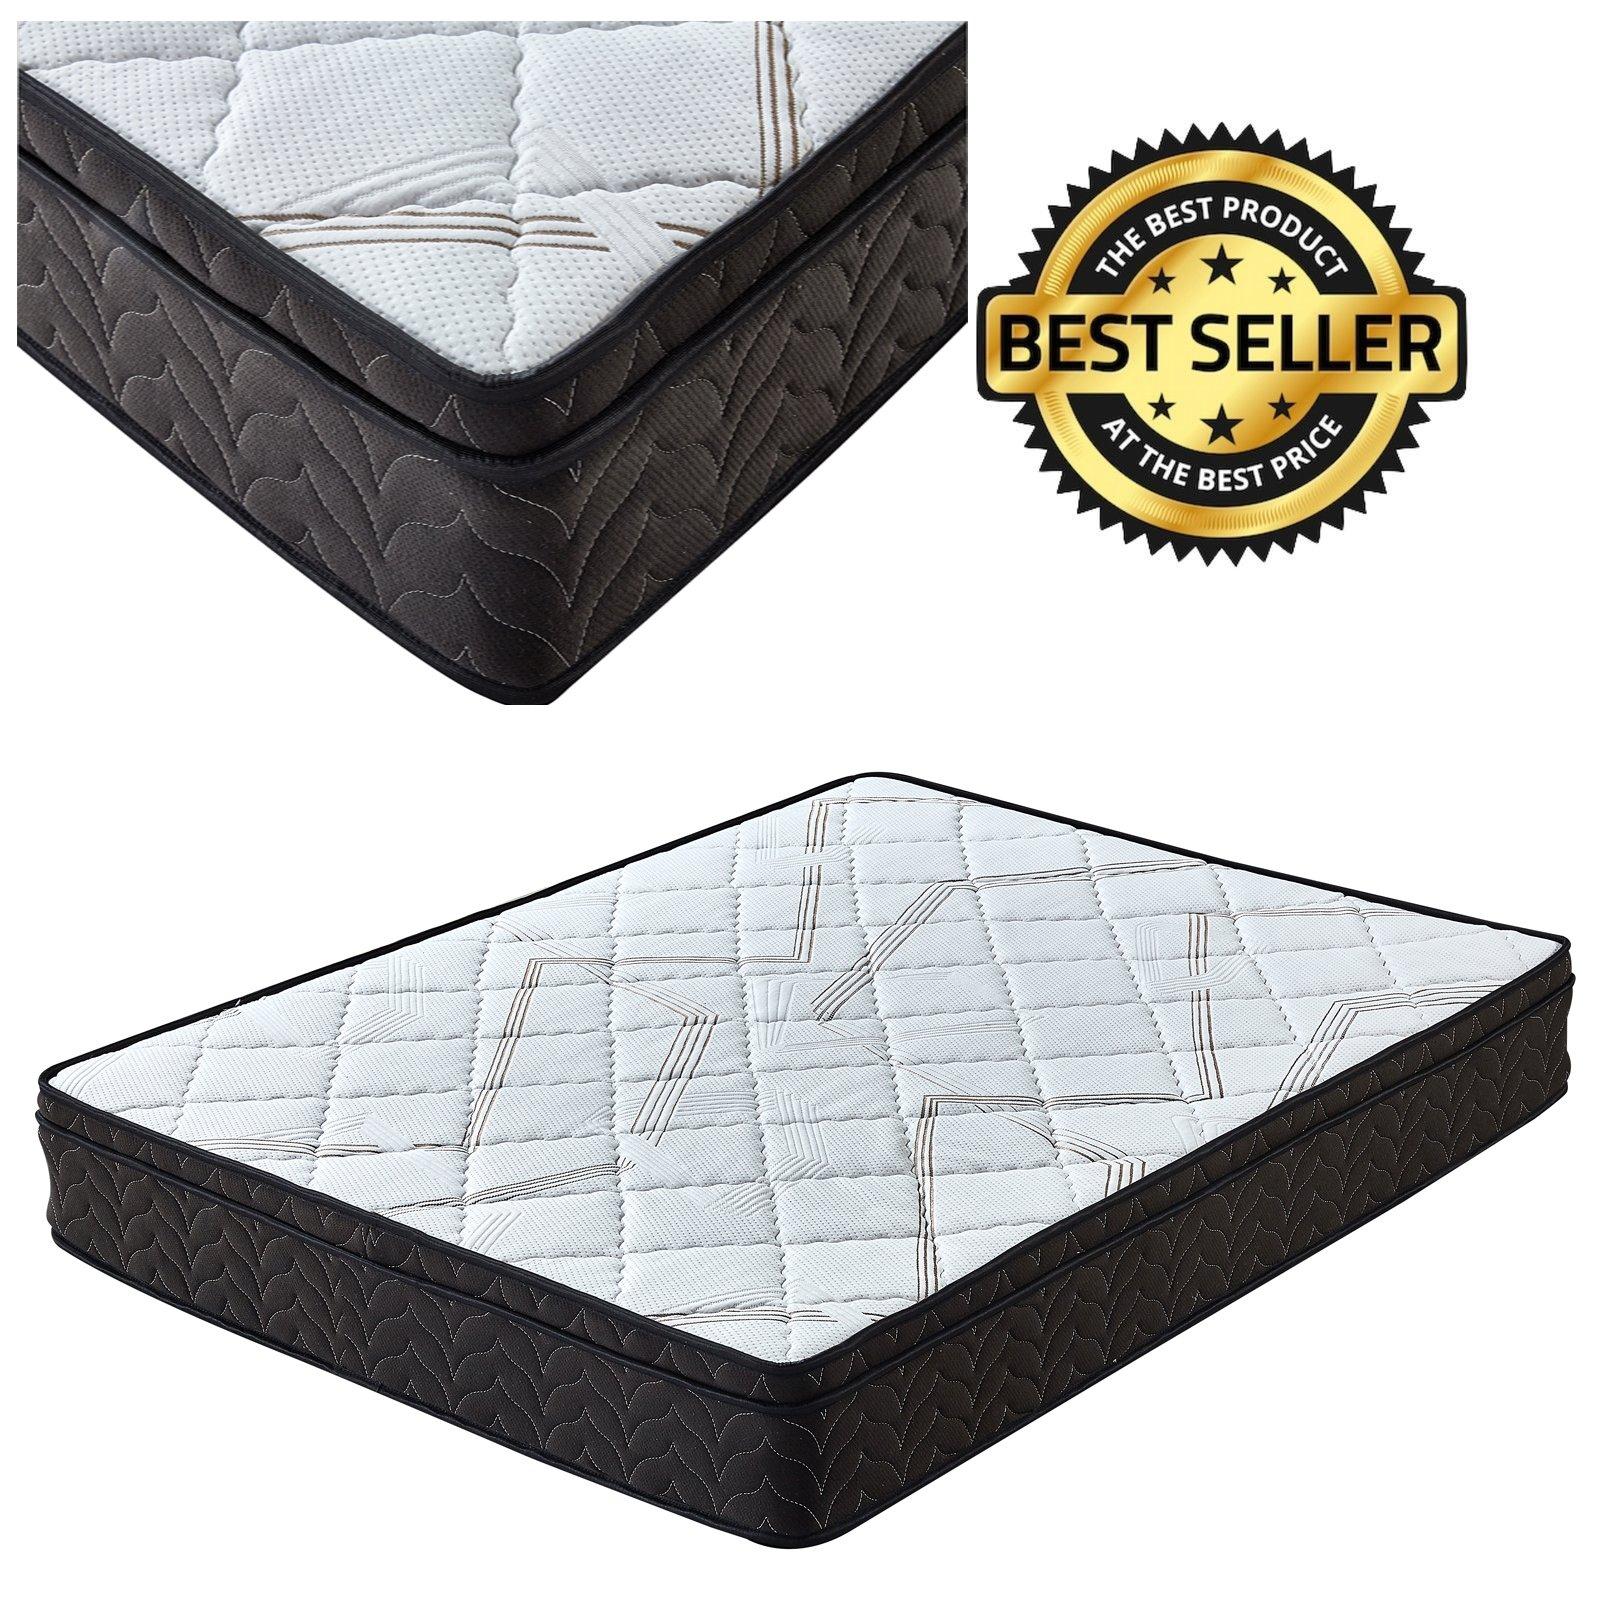 Premium Sleep Comfort 9 Inch Euro Top Mattress Twin Soft Plush Pillow Top Mattress Twin Size Model: T-005 by AS Quality Signature Mattresses